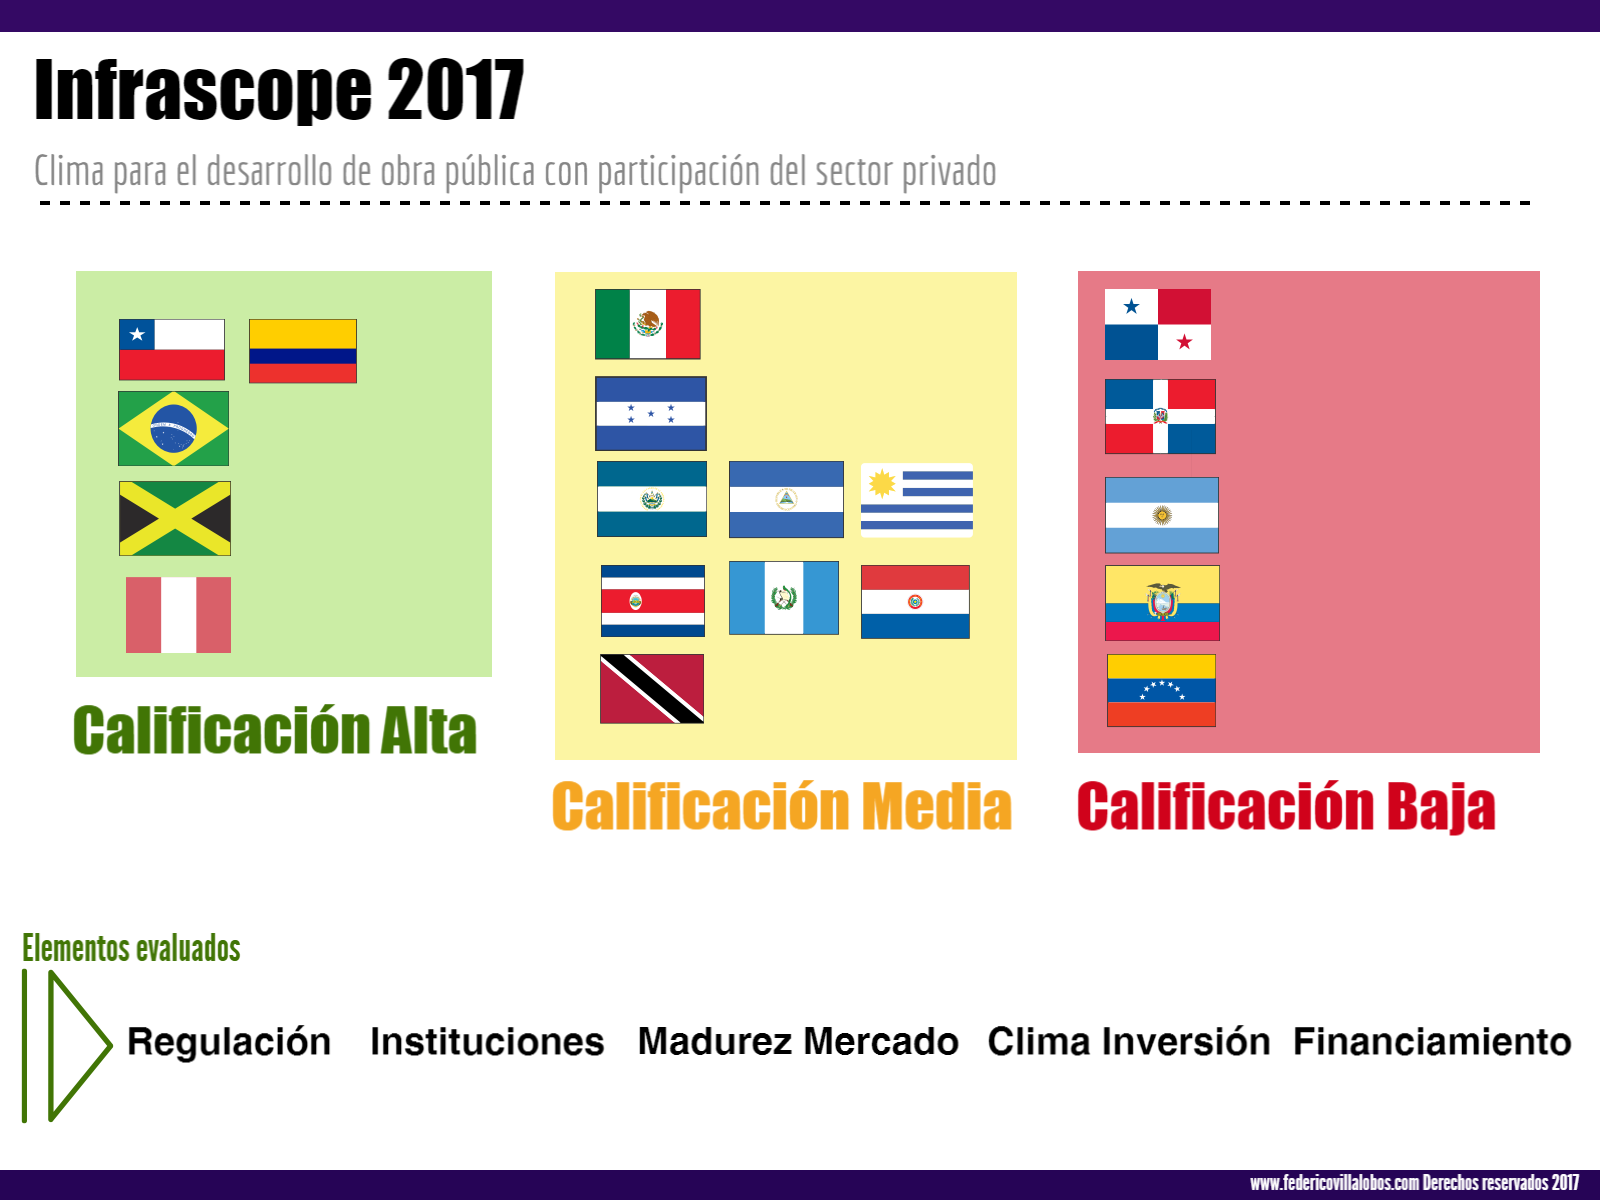 Infrascope 2017